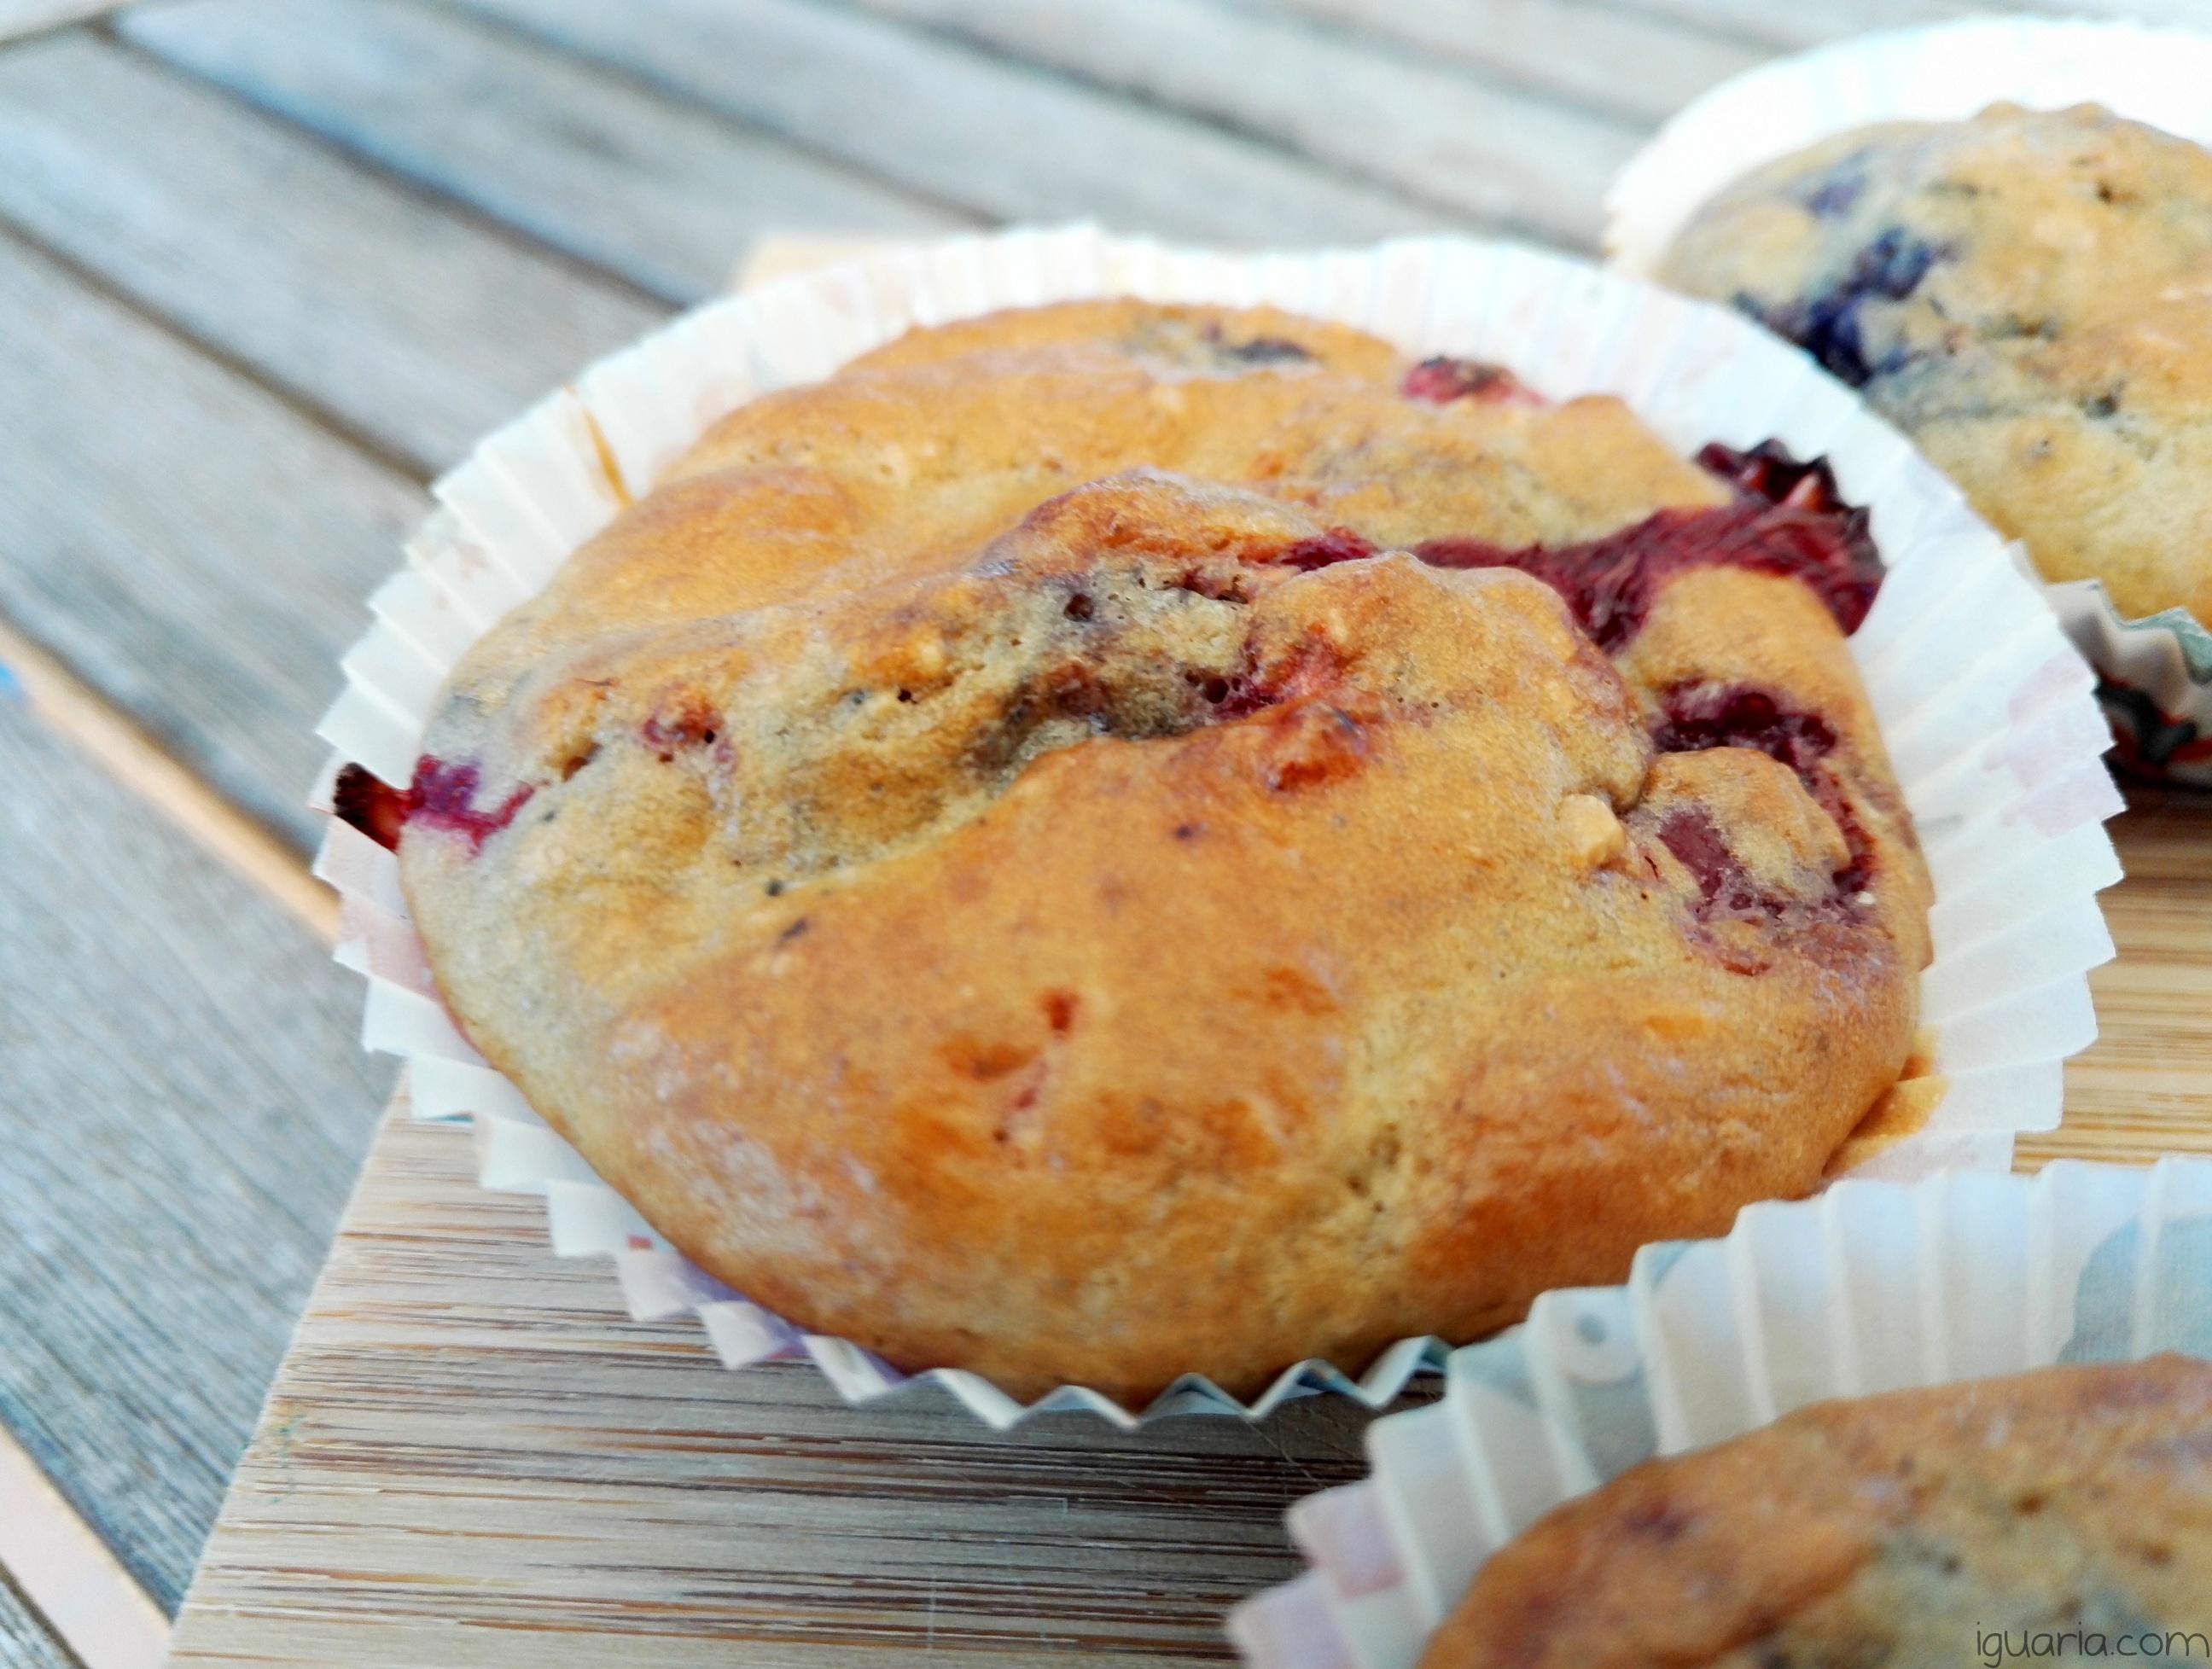 Iguaria_Cupcakes-Saudaveis-Frutos-Silvestres